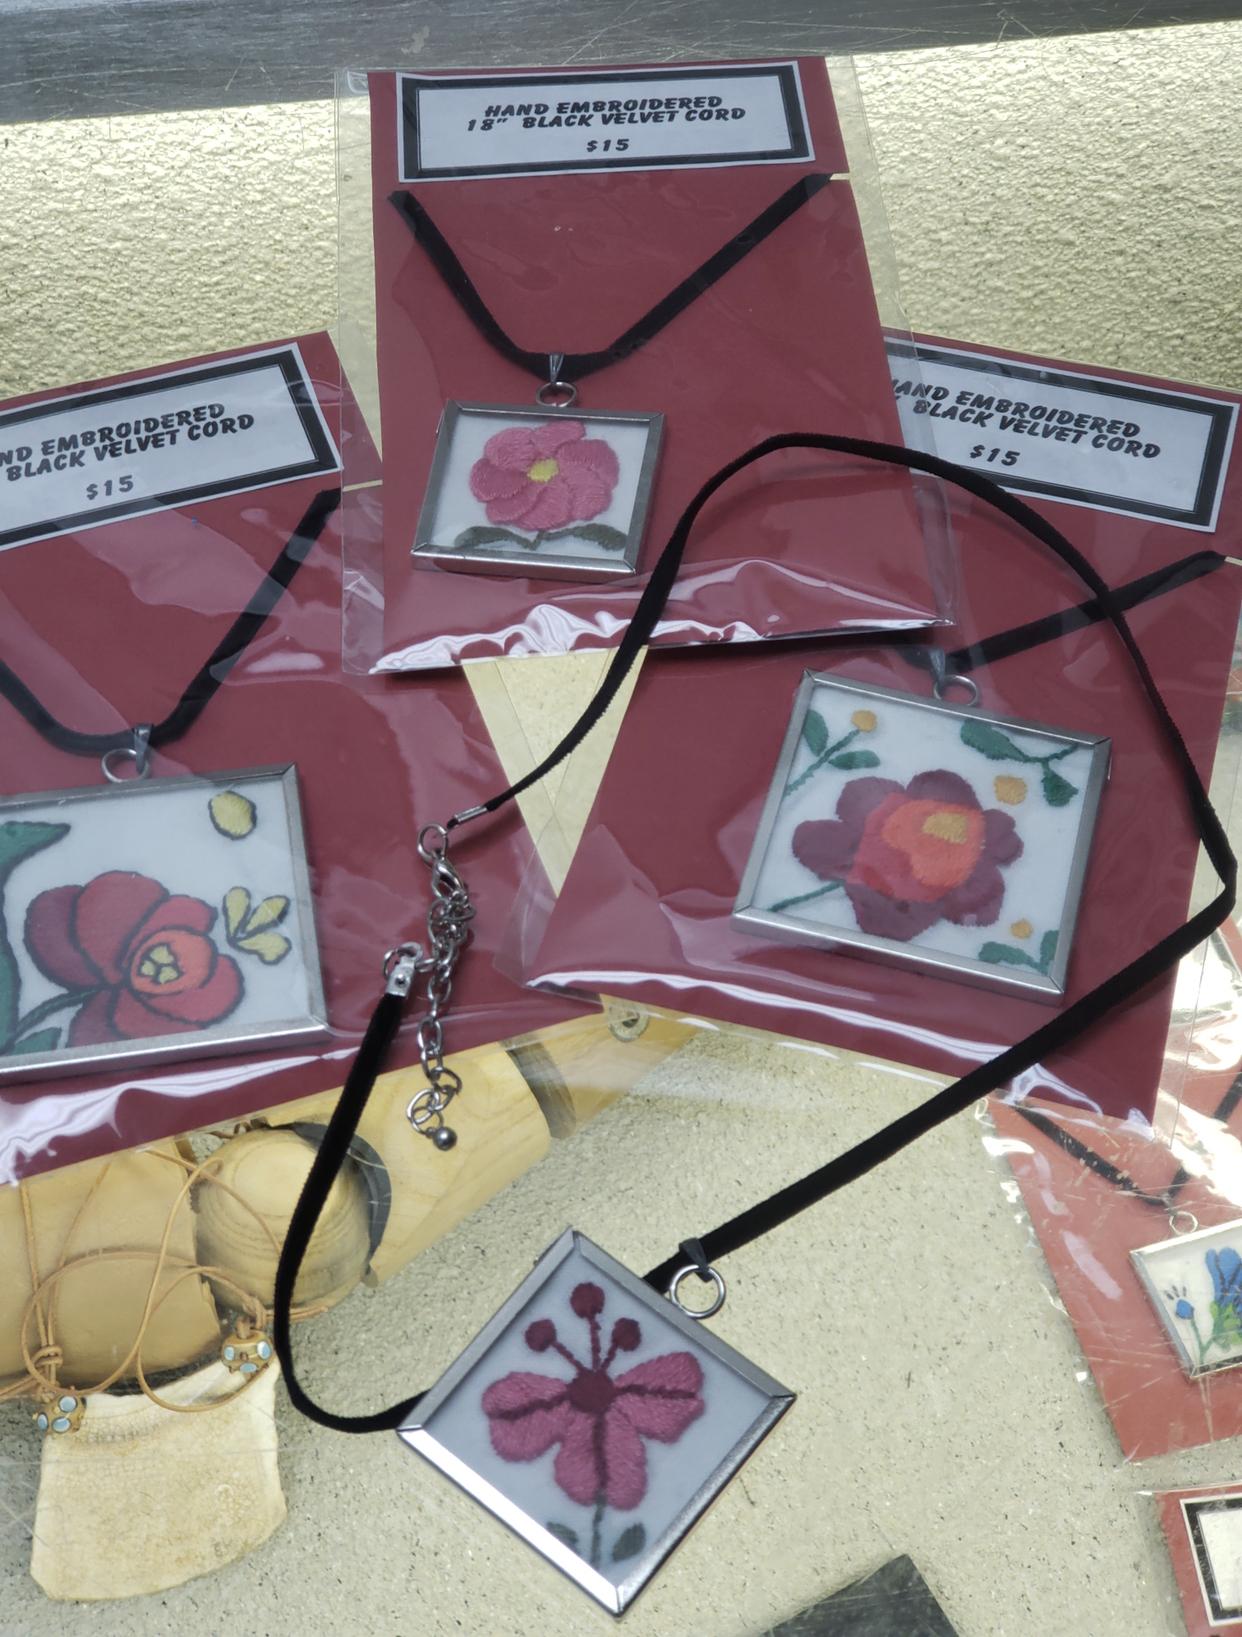 Embroidered folk art pendants $15